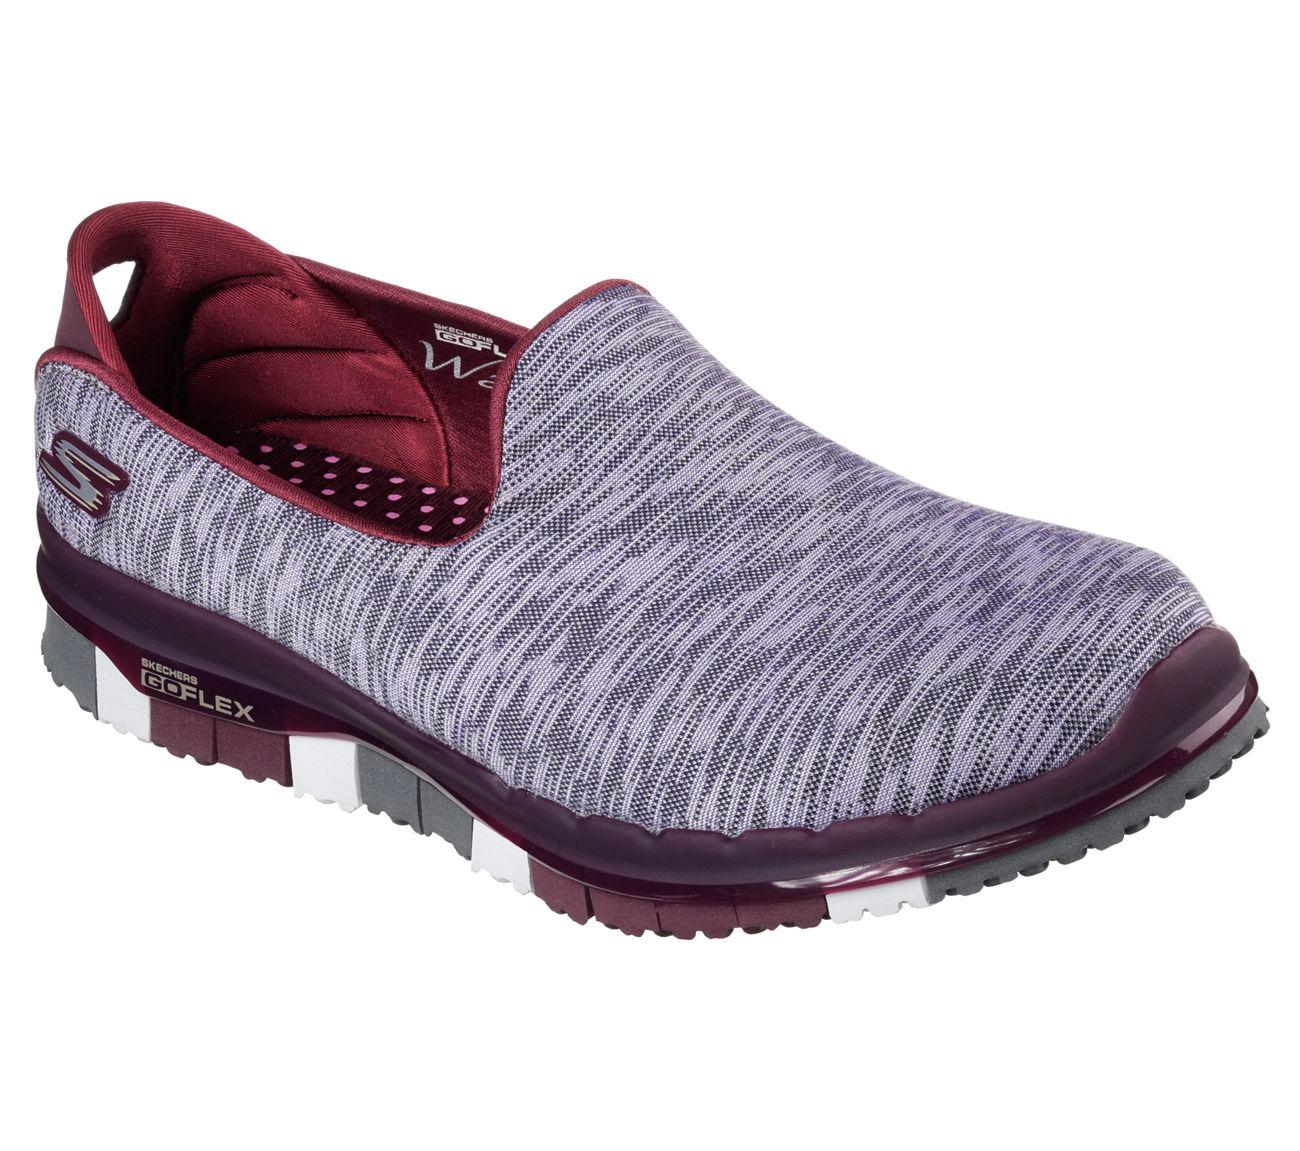 skechers 14015 burg women 39 s go flex walk ability walking ebay. Black Bedroom Furniture Sets. Home Design Ideas